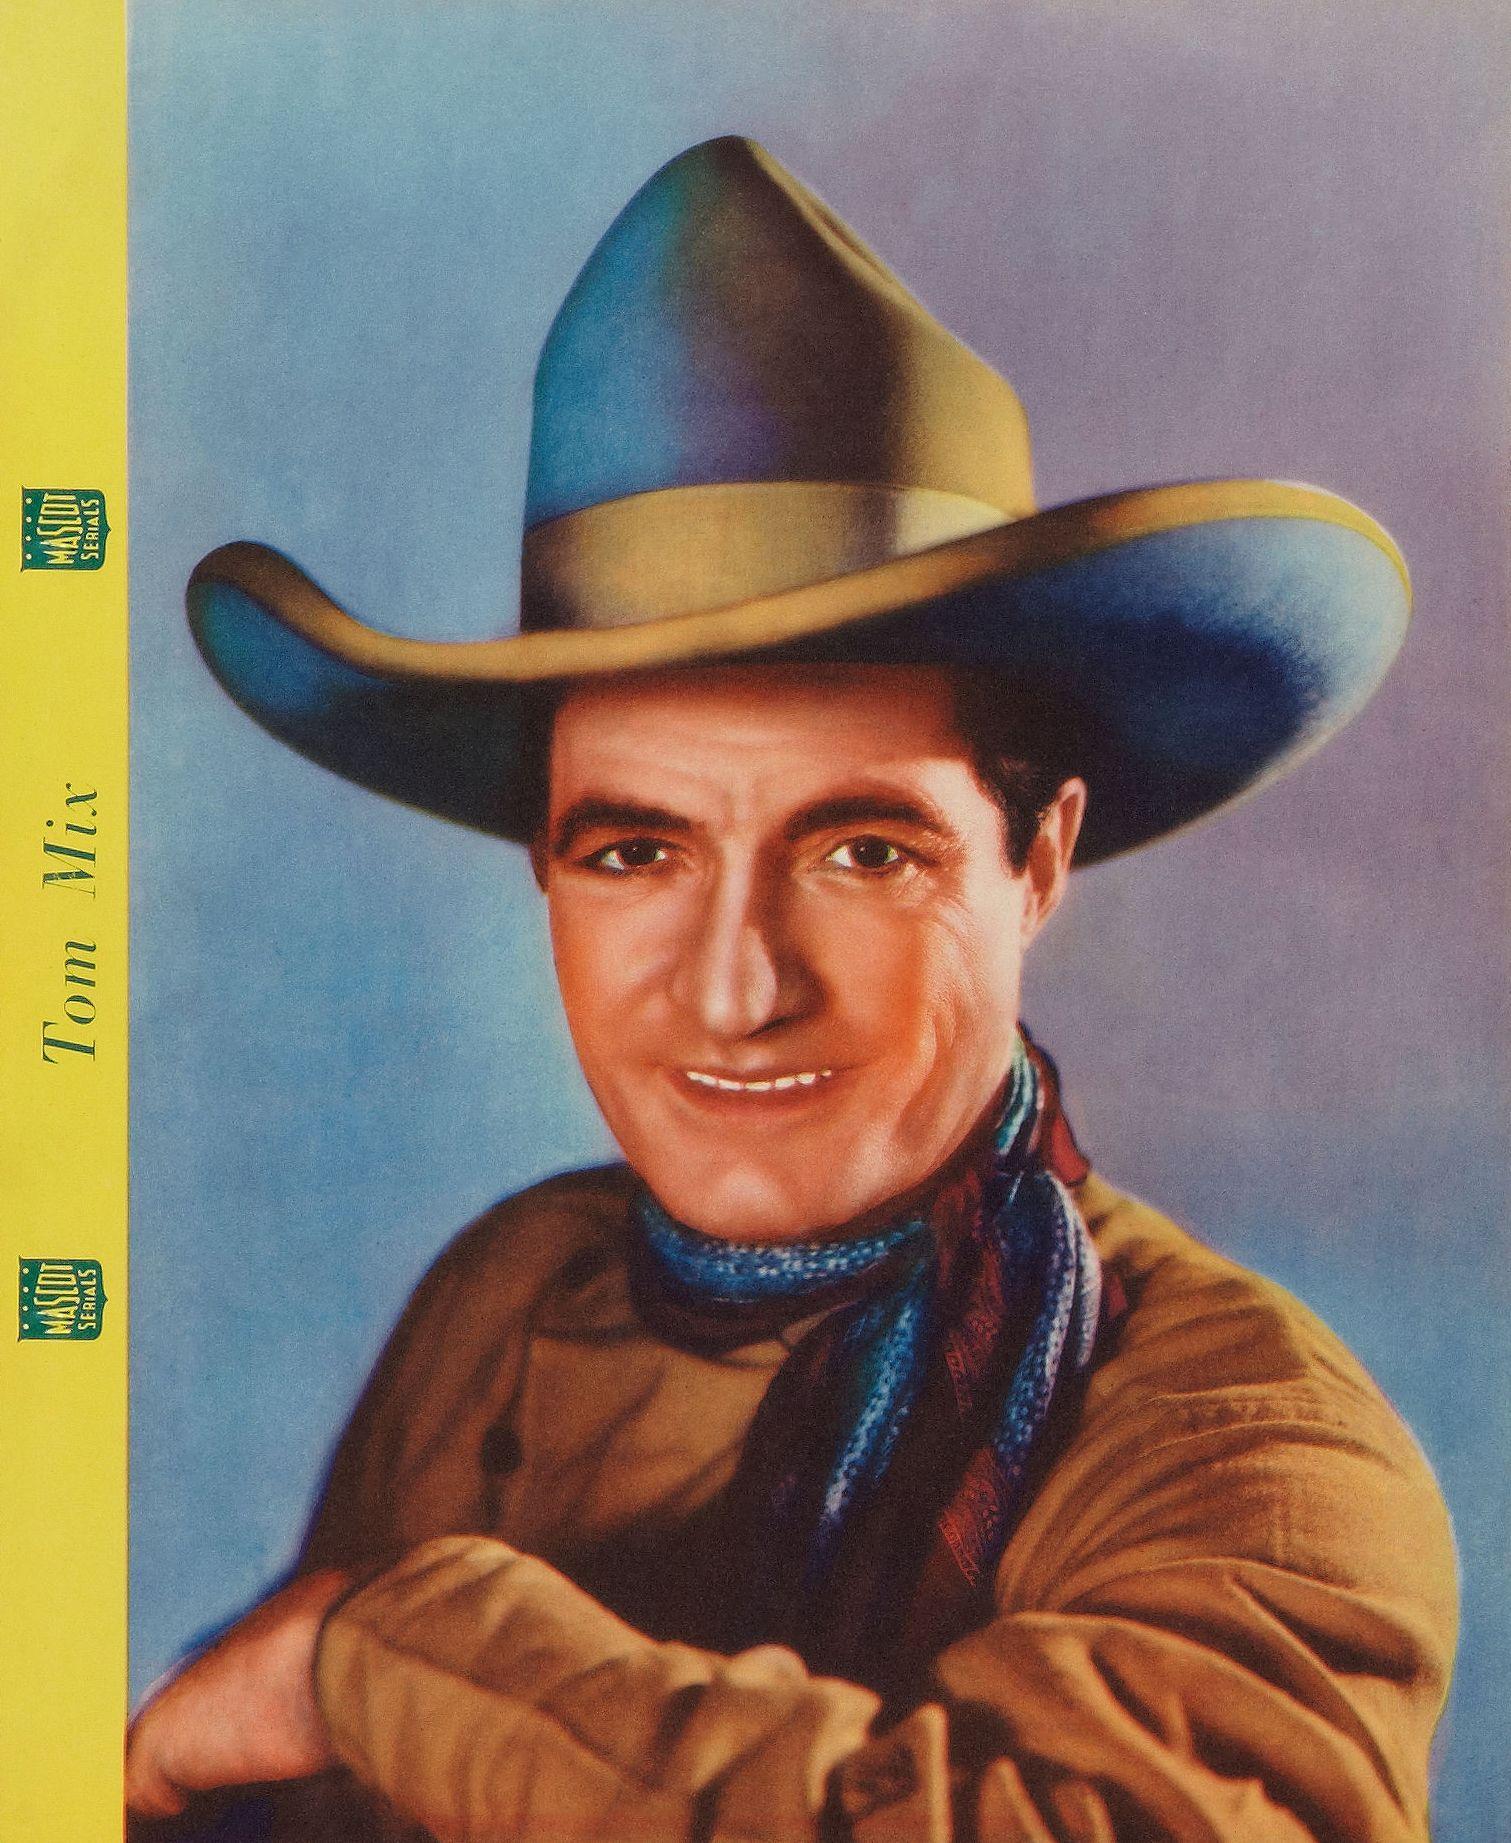 d0b103e60 Tom Mix Dixie Cup   Tom Mix   Cowboy hats, Western film, Cowboys